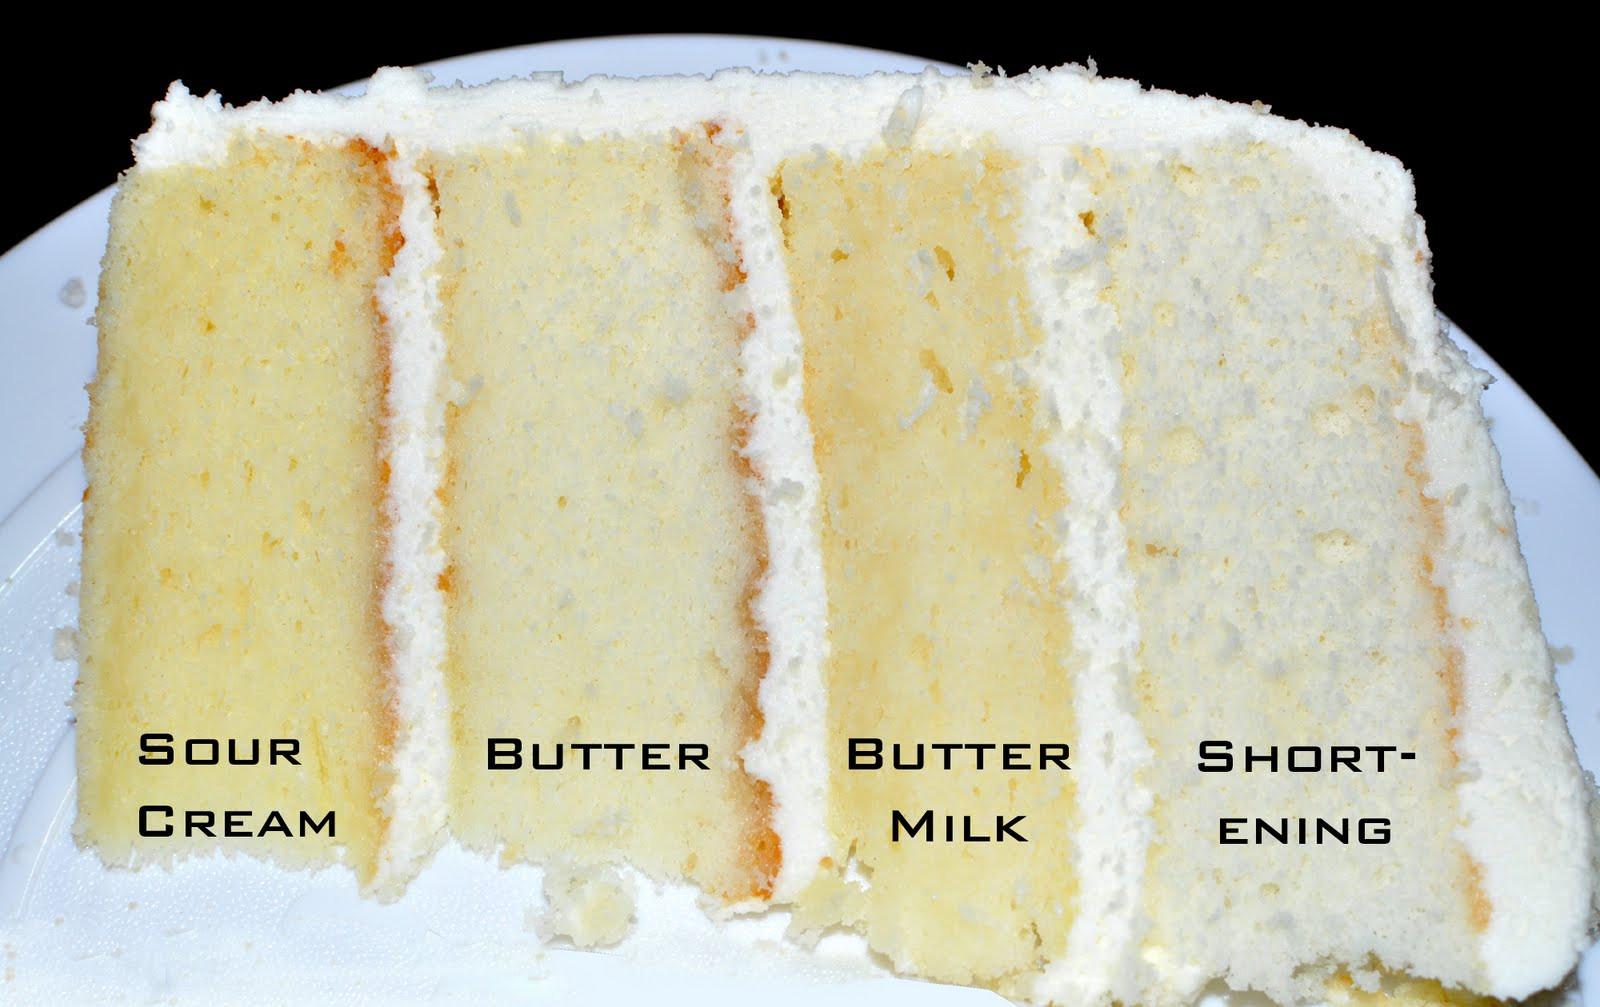 Best White Wedding Cake Recipe  Best white wedding cake recipes from scratch idea in